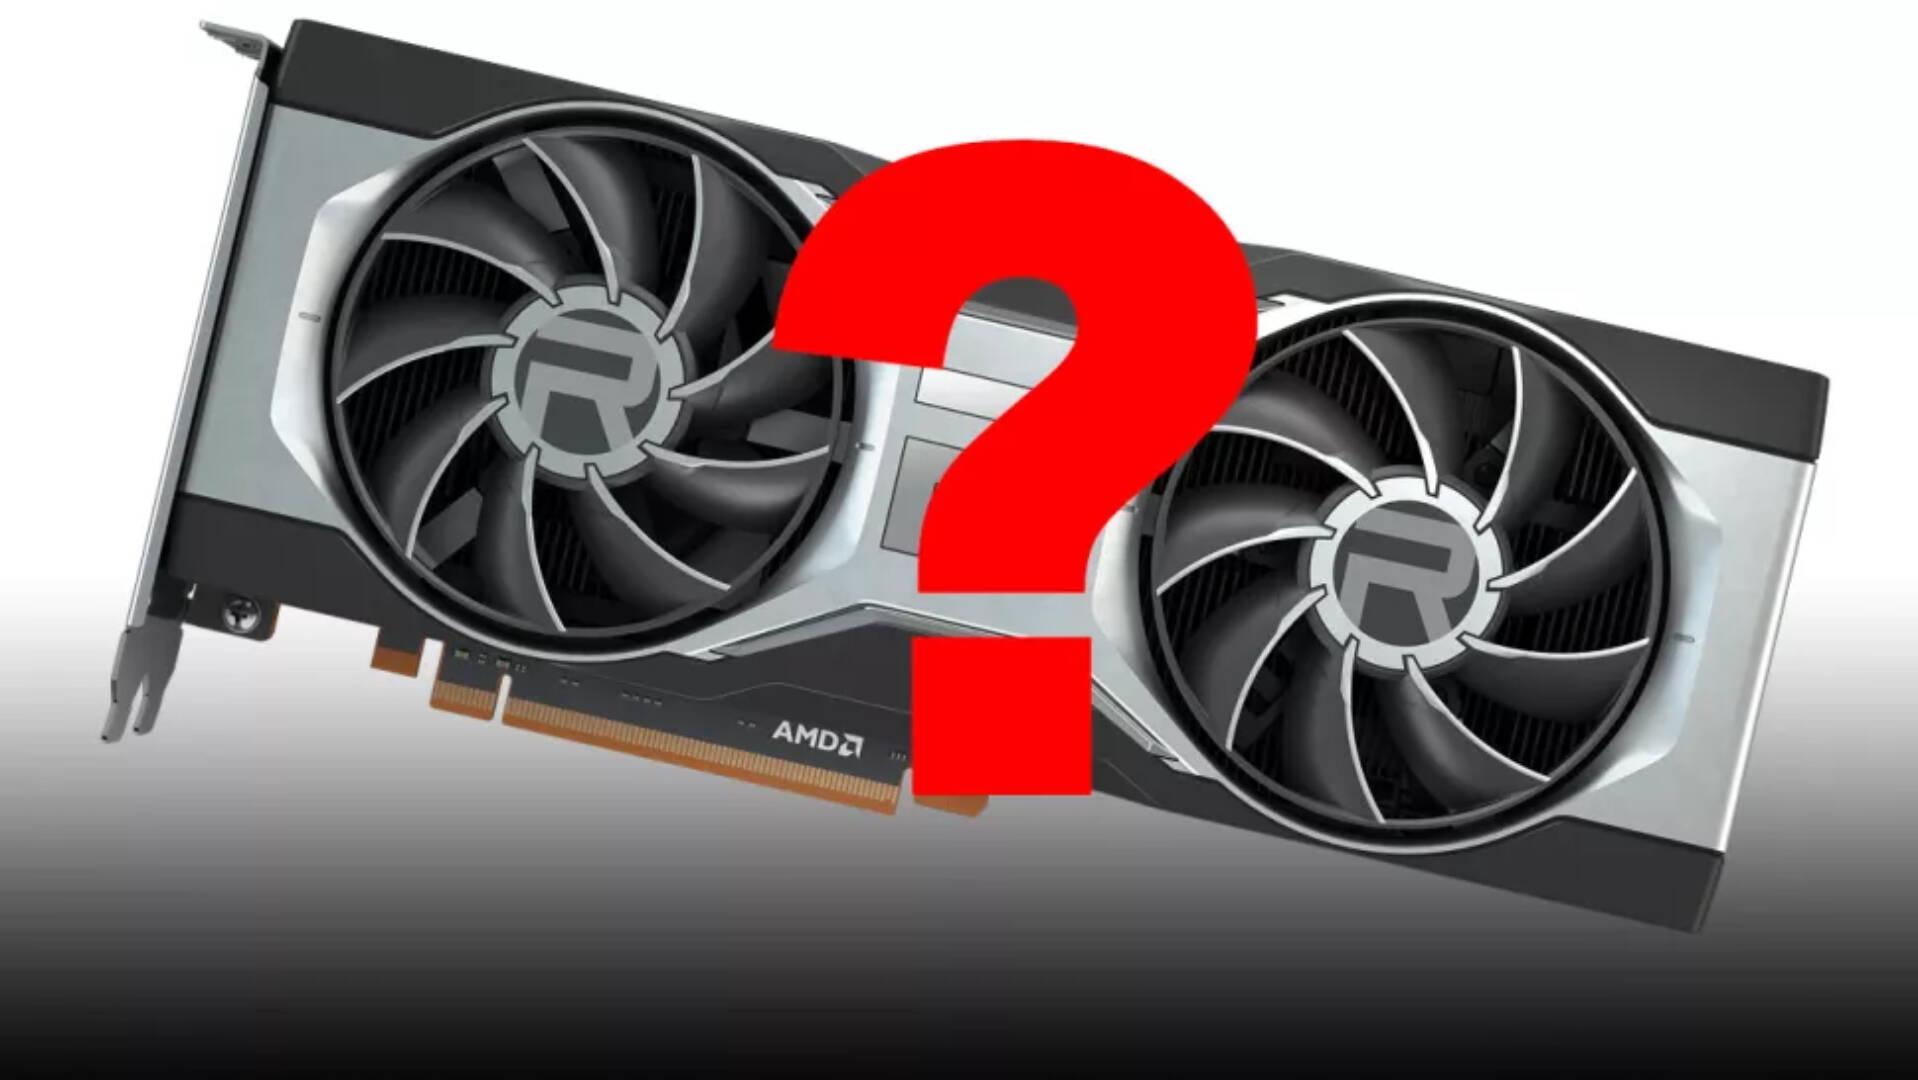 Gigabyte Radeon RX 6600 XT